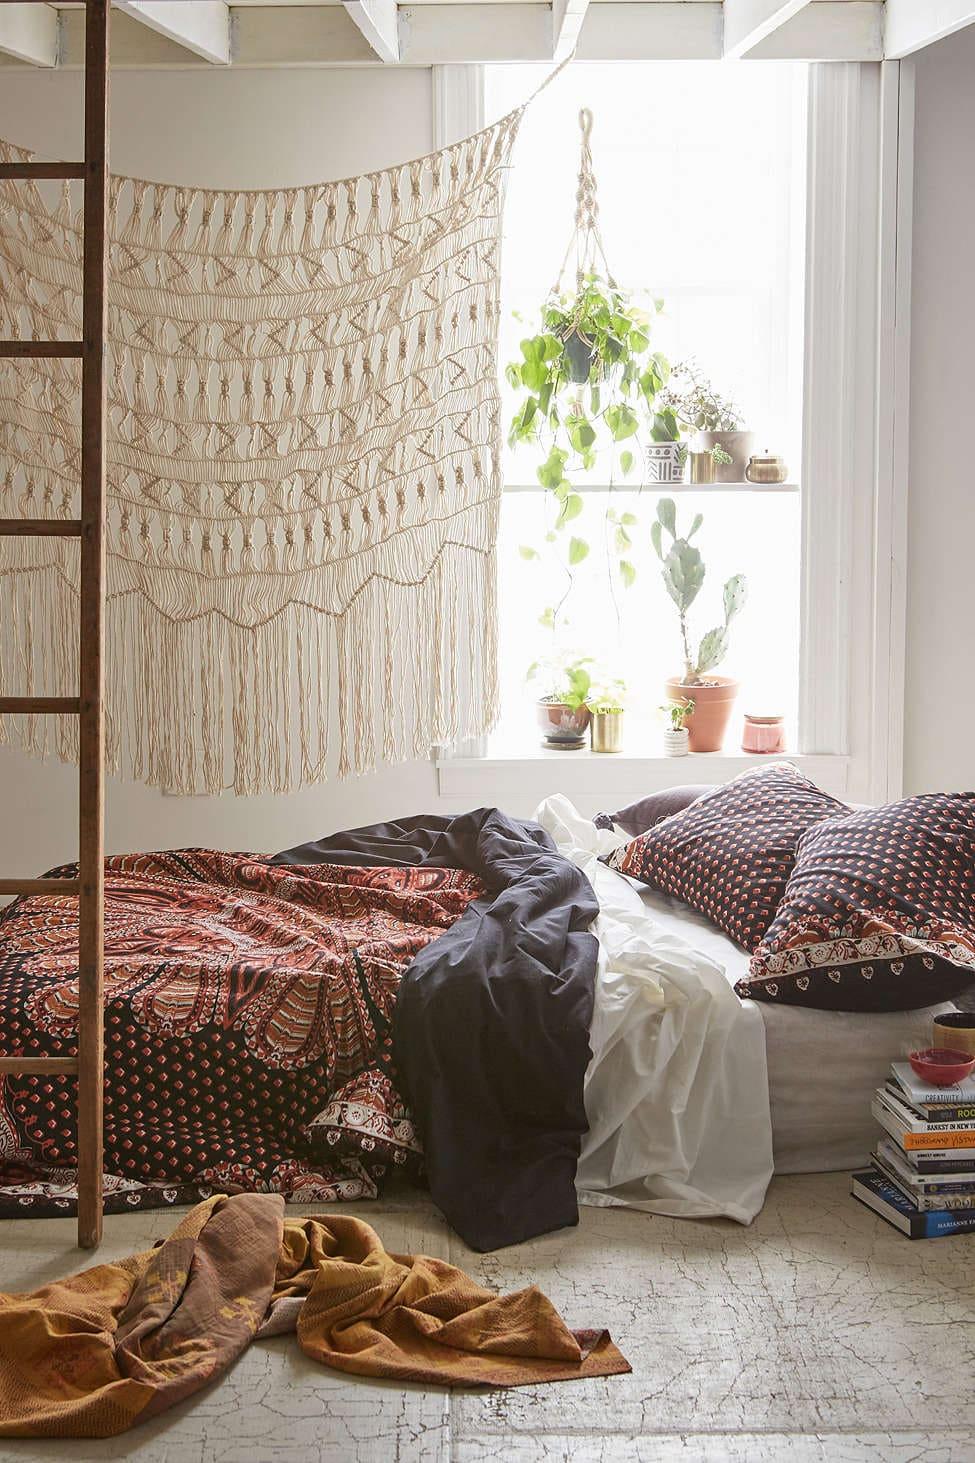 8.Simphome.com Add Macramé Tapestry